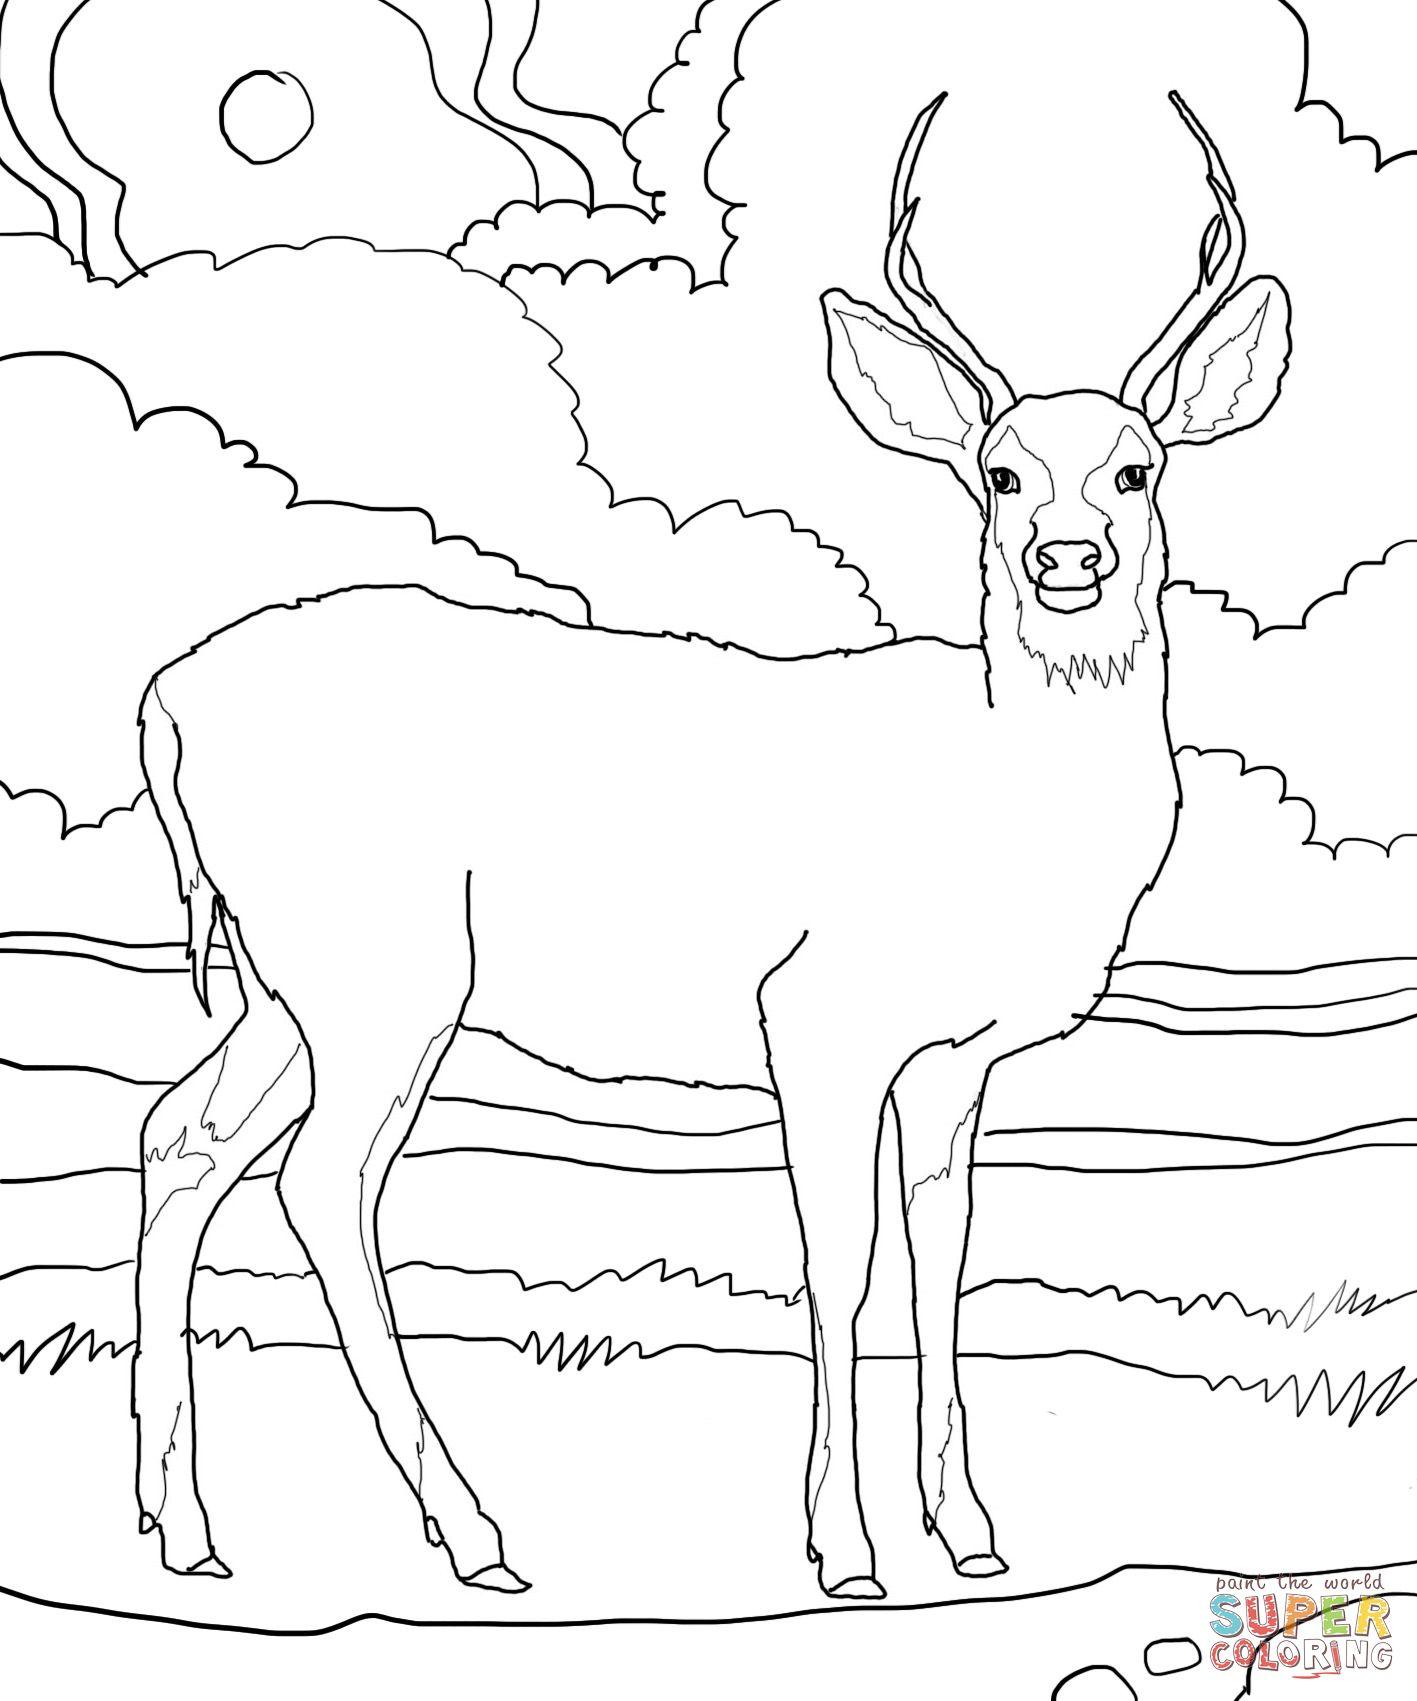 Mule Deer Coloring page | SuperColoring.com | Deer ...